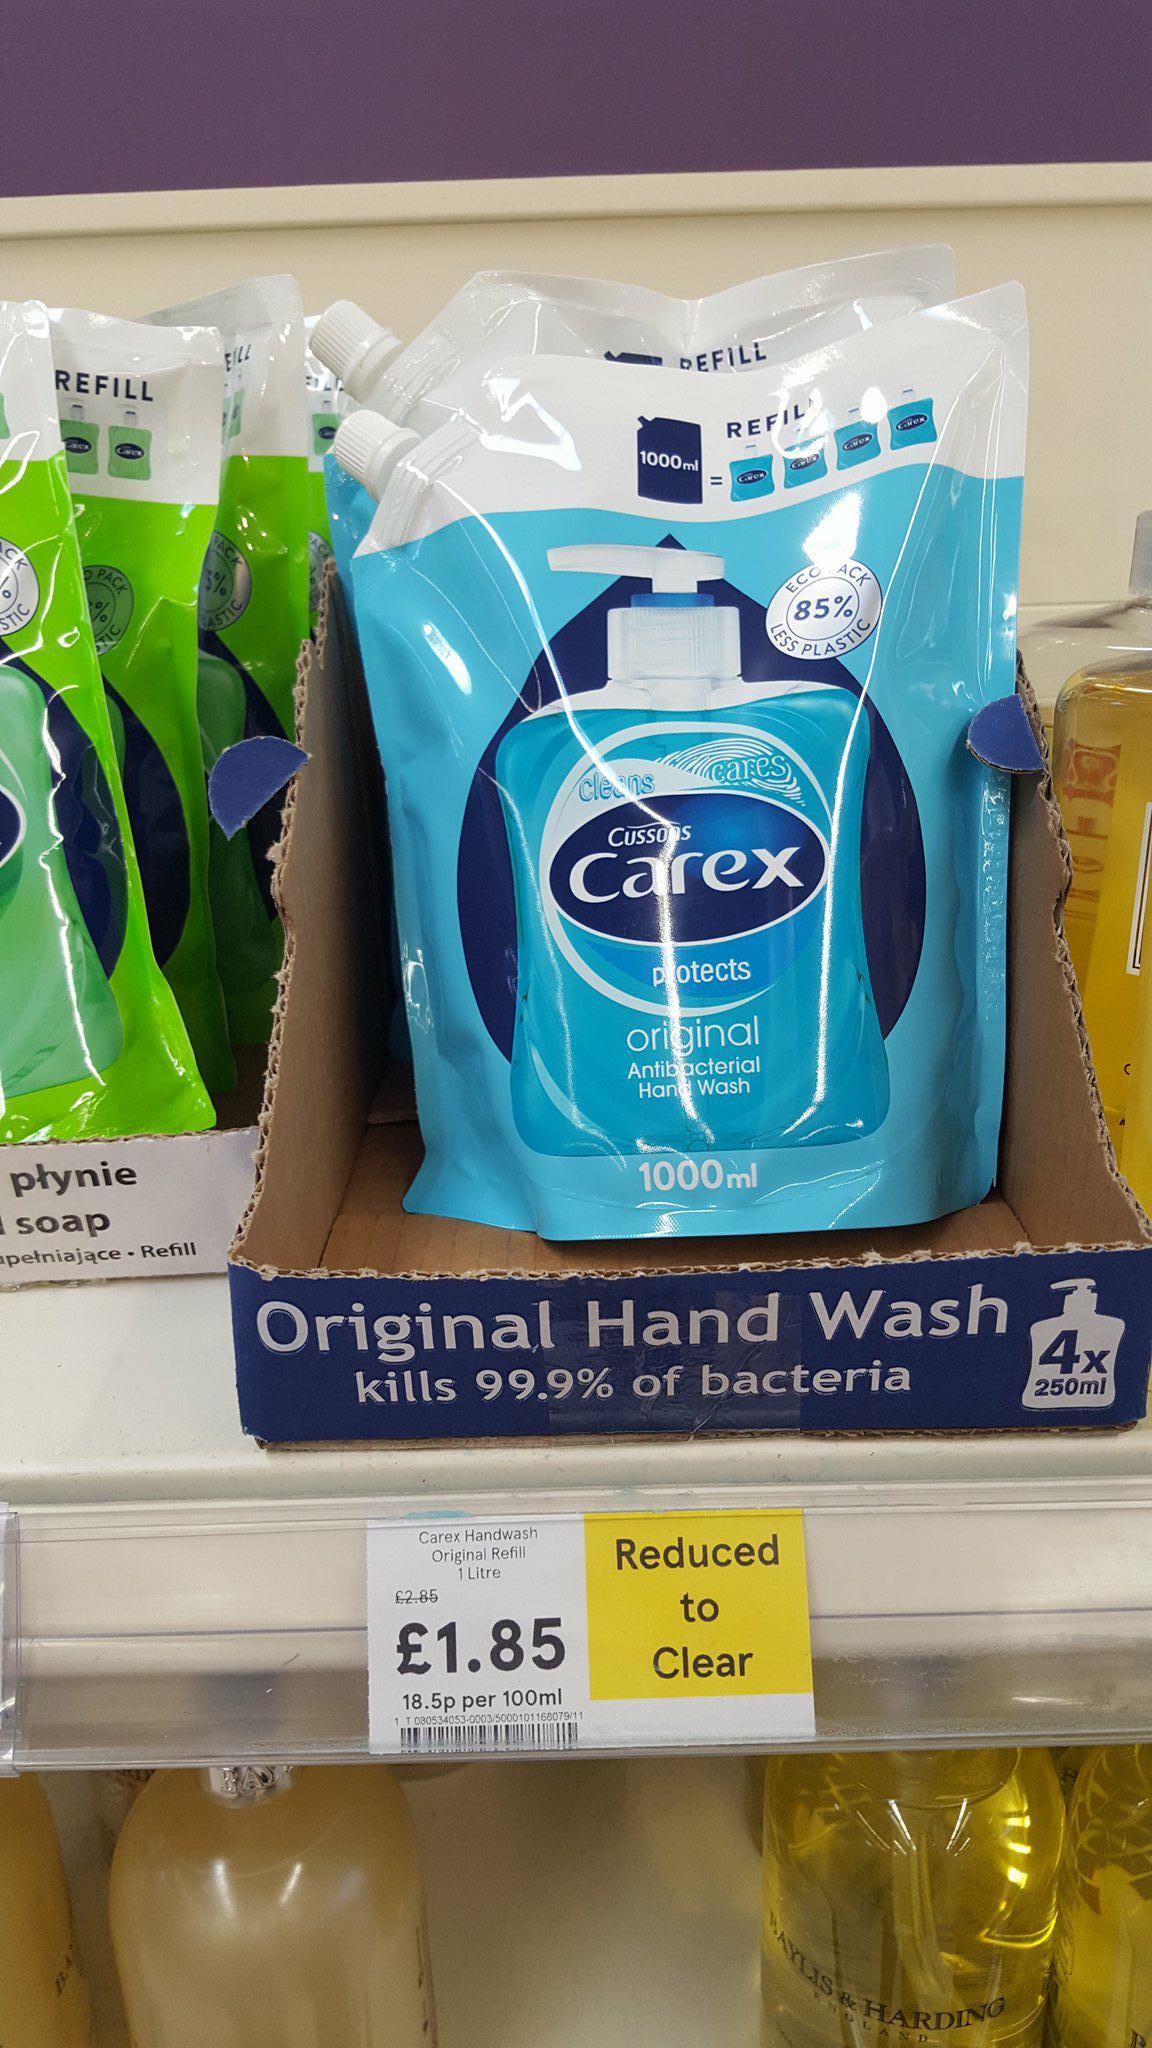 Carex original antibacterial handwash 1 litre refill £1.85 (Tesco)